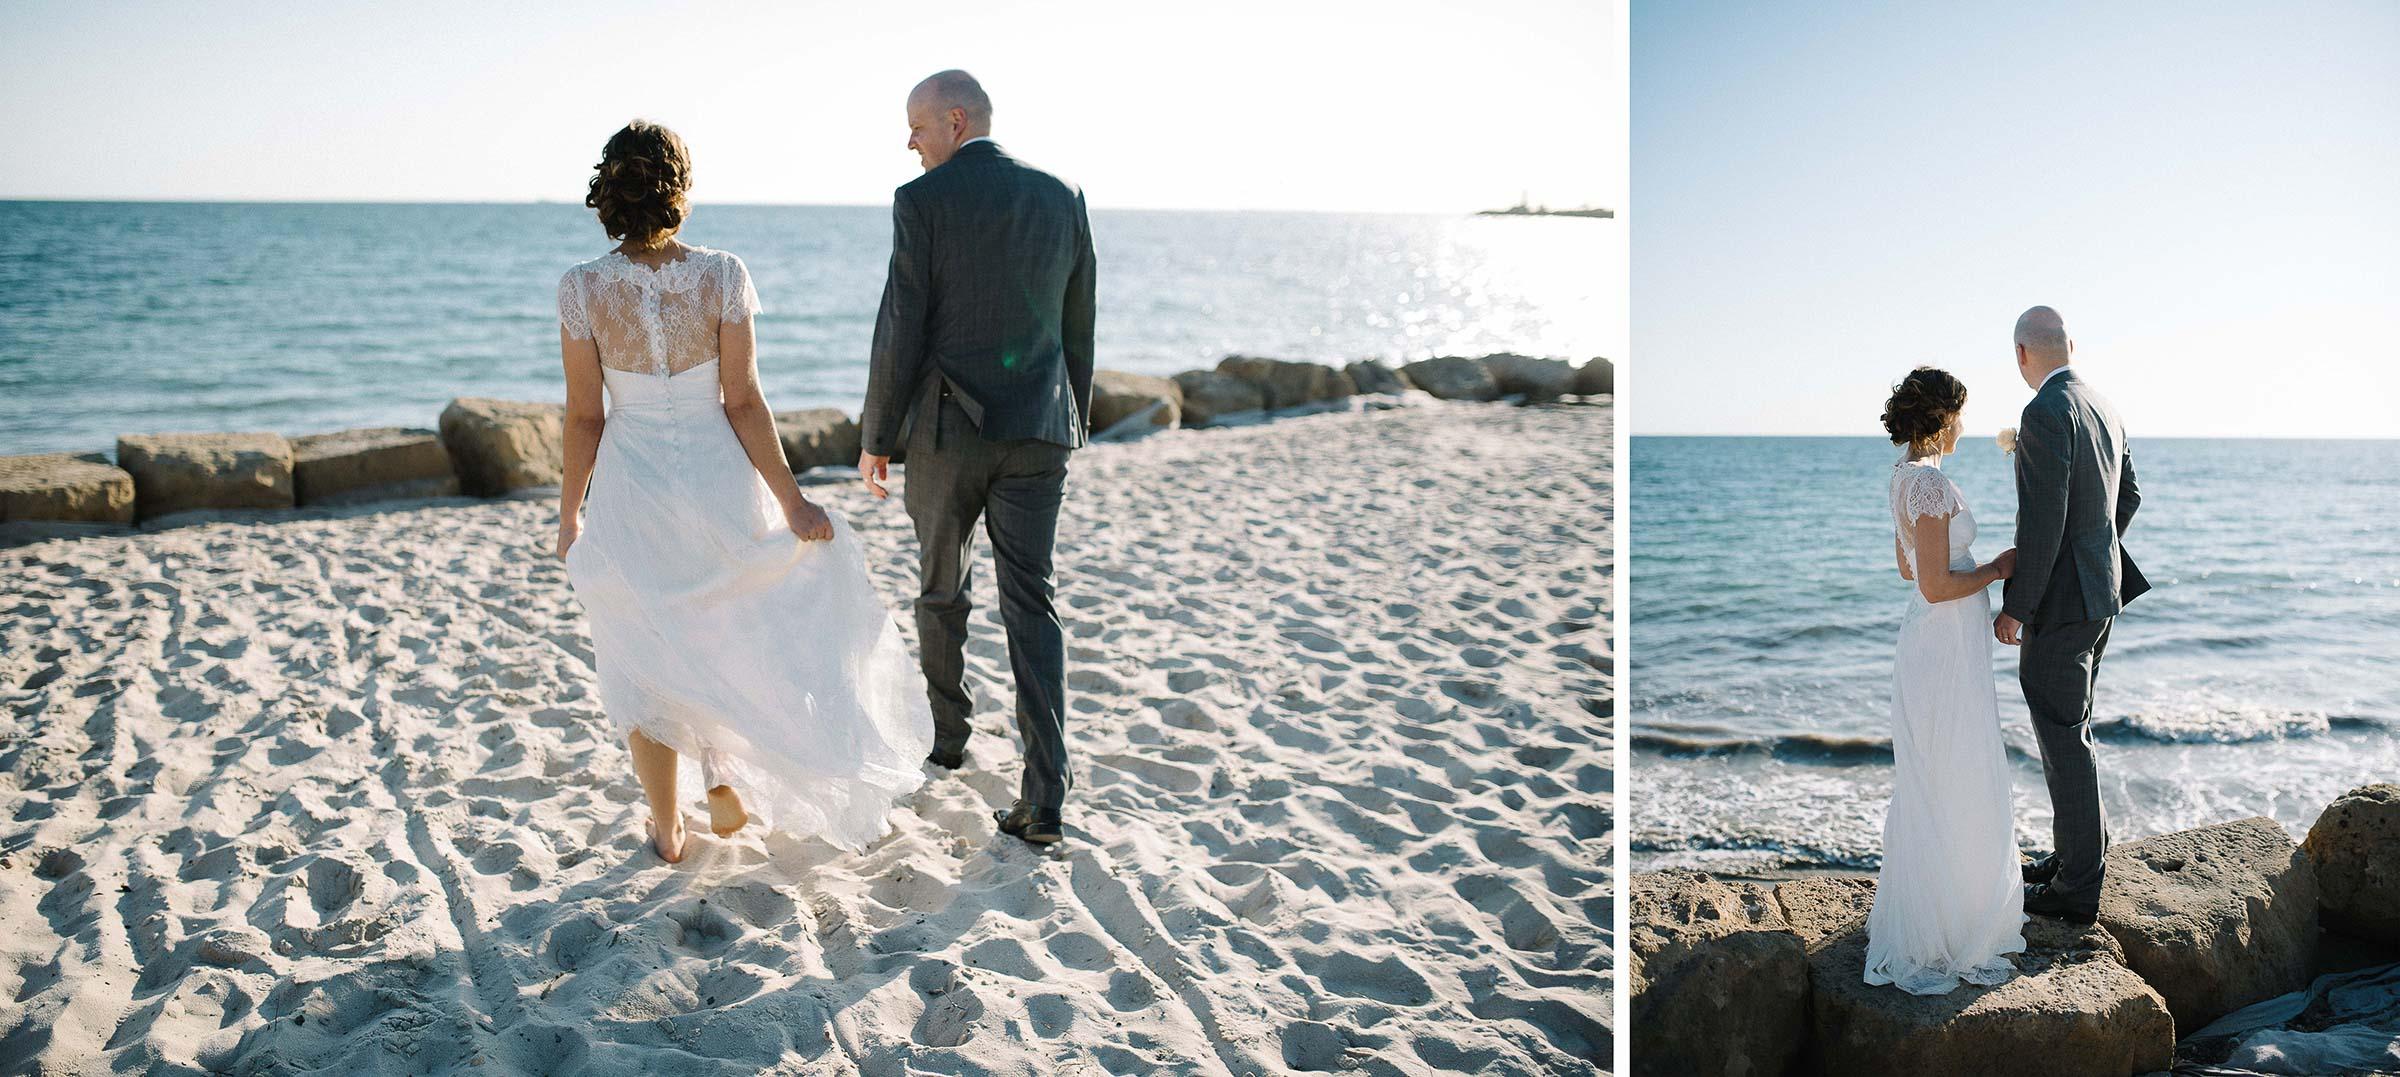 59-beach wedding perth fremantle.jpg